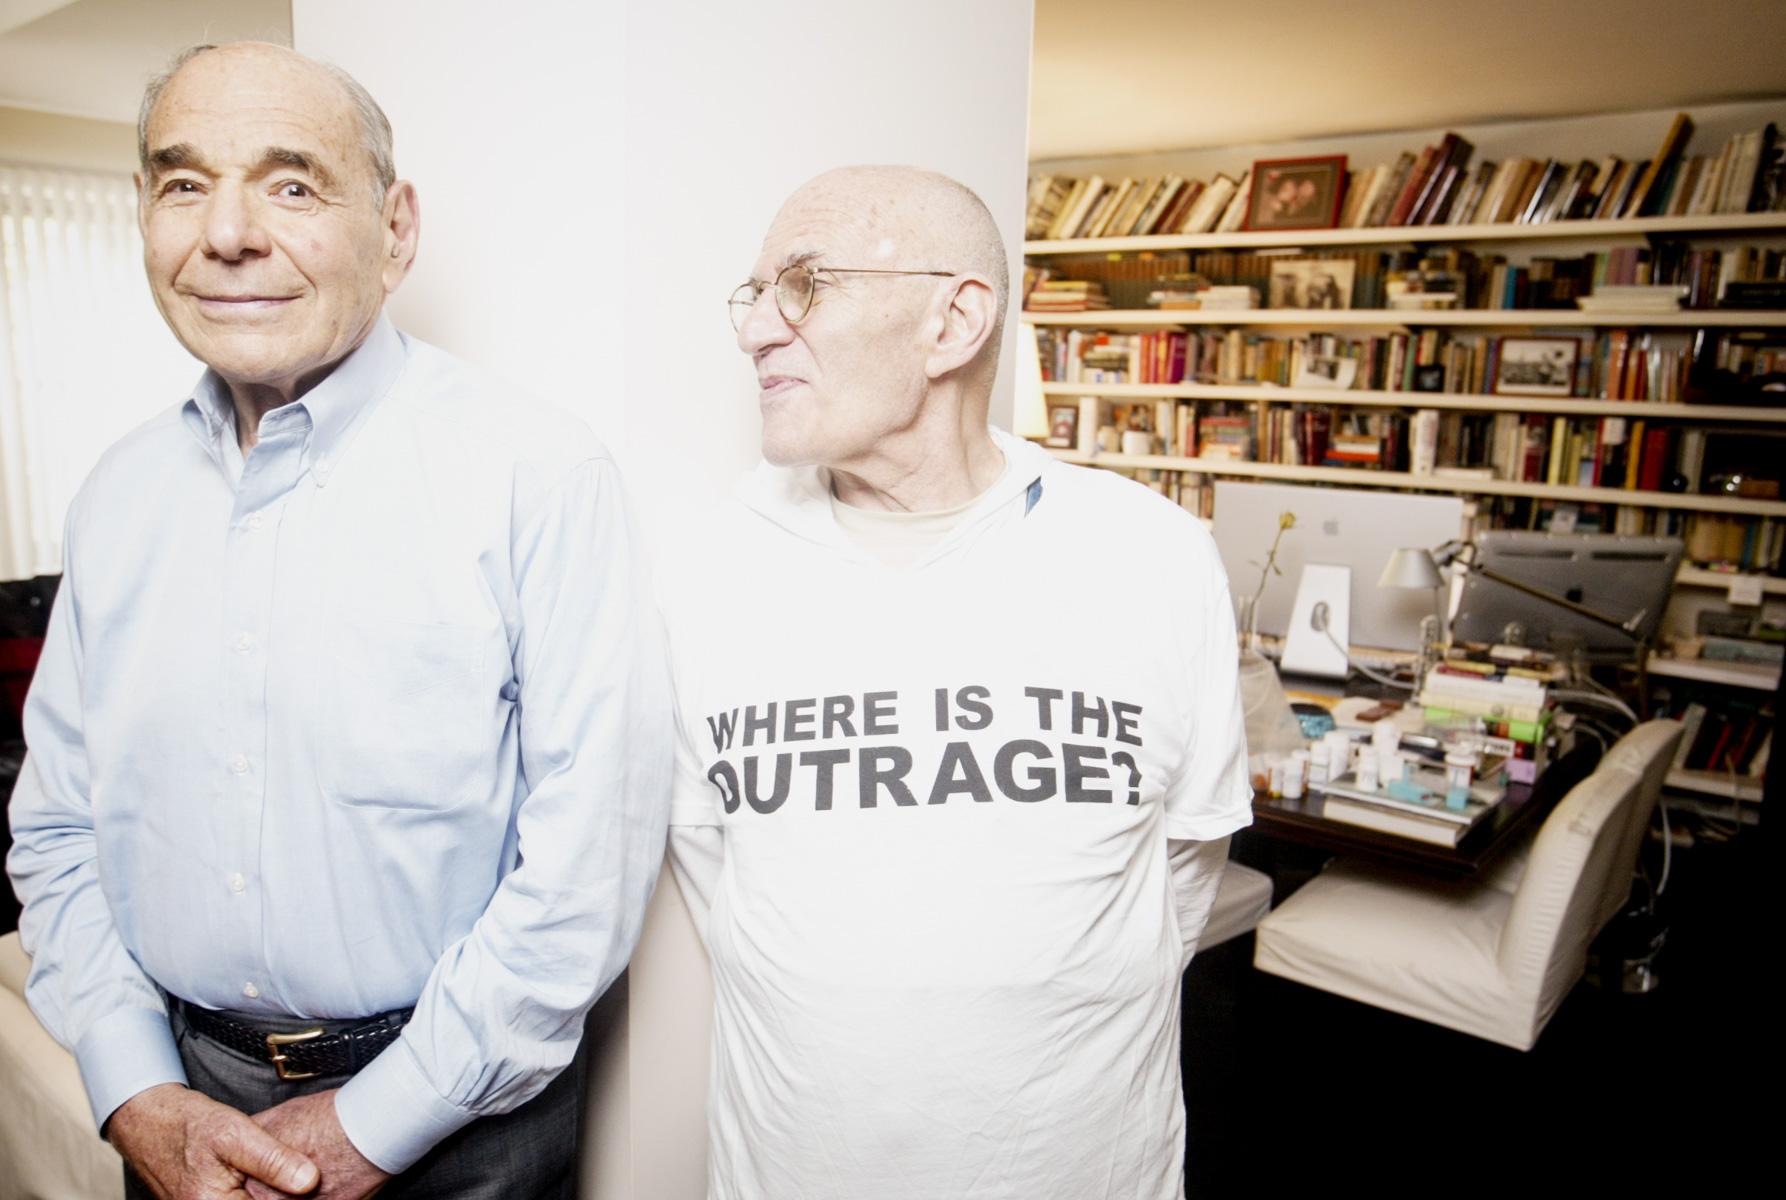 outrage-where-1.jpg